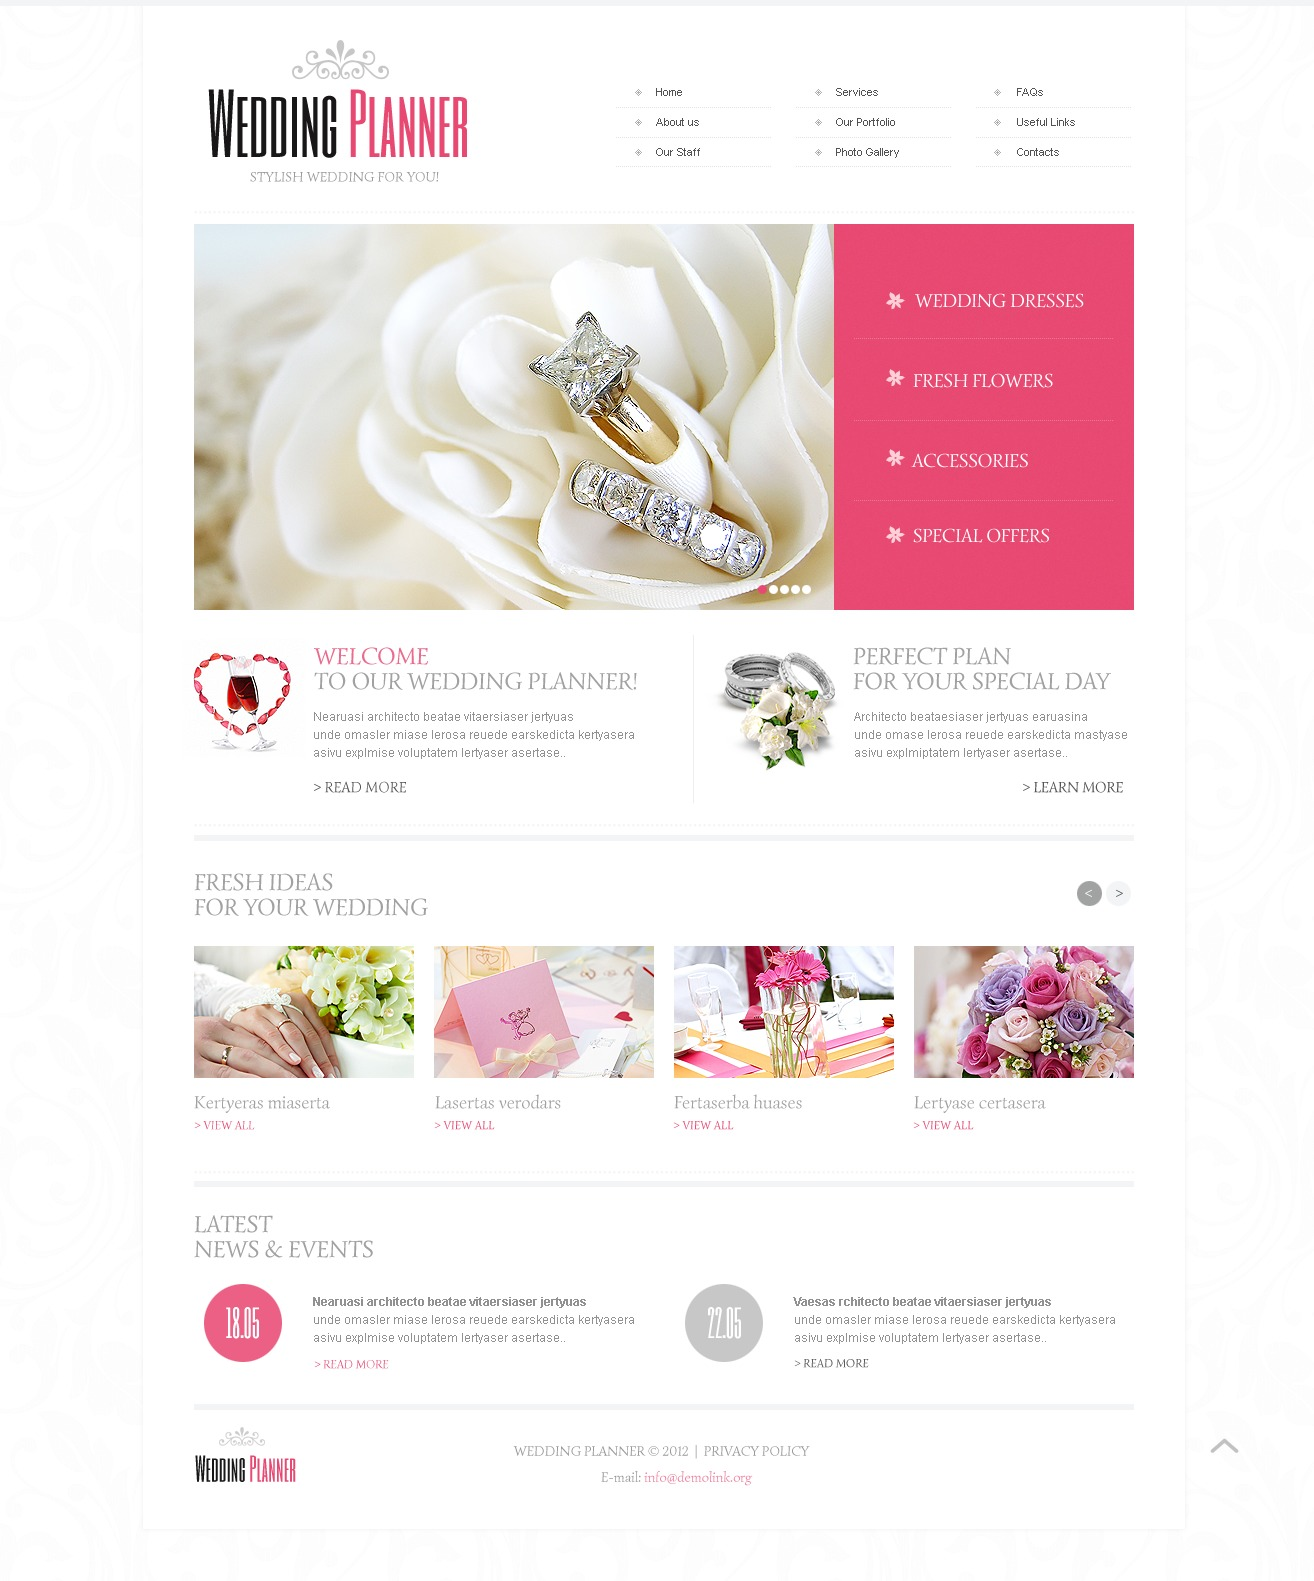 Wedding planner websites templates.